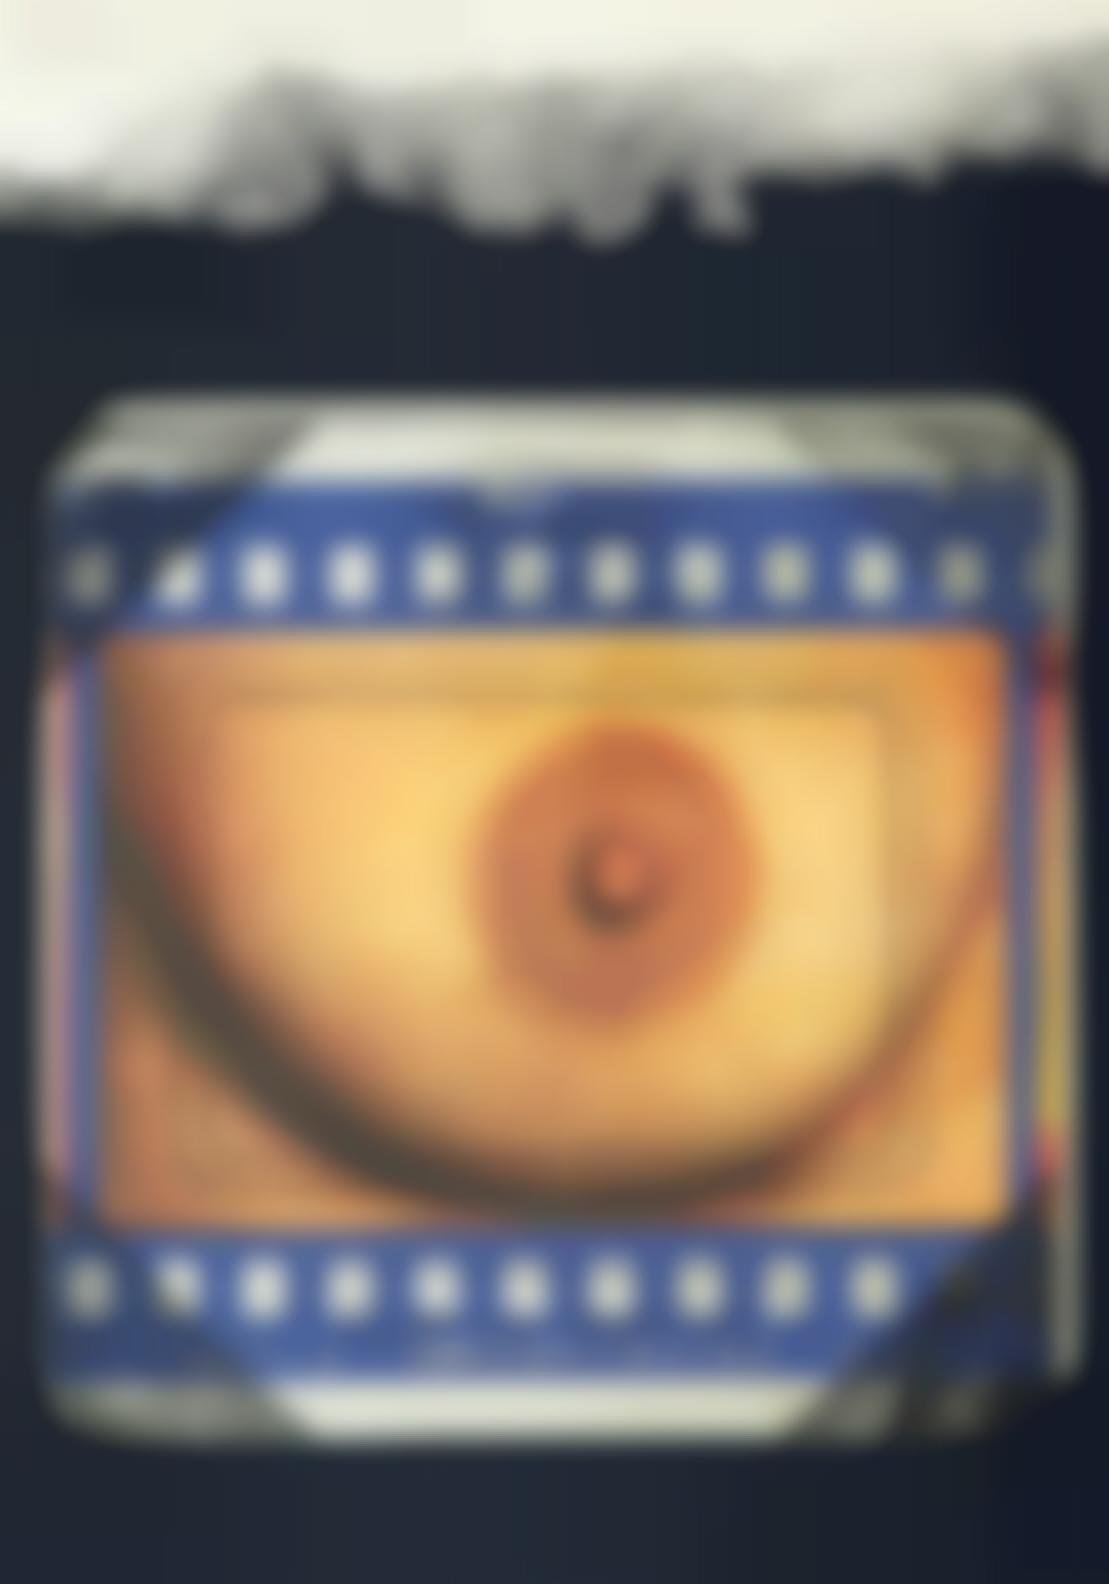 Joe Tilson-Transparency Clip-O-Matic Breast-1971